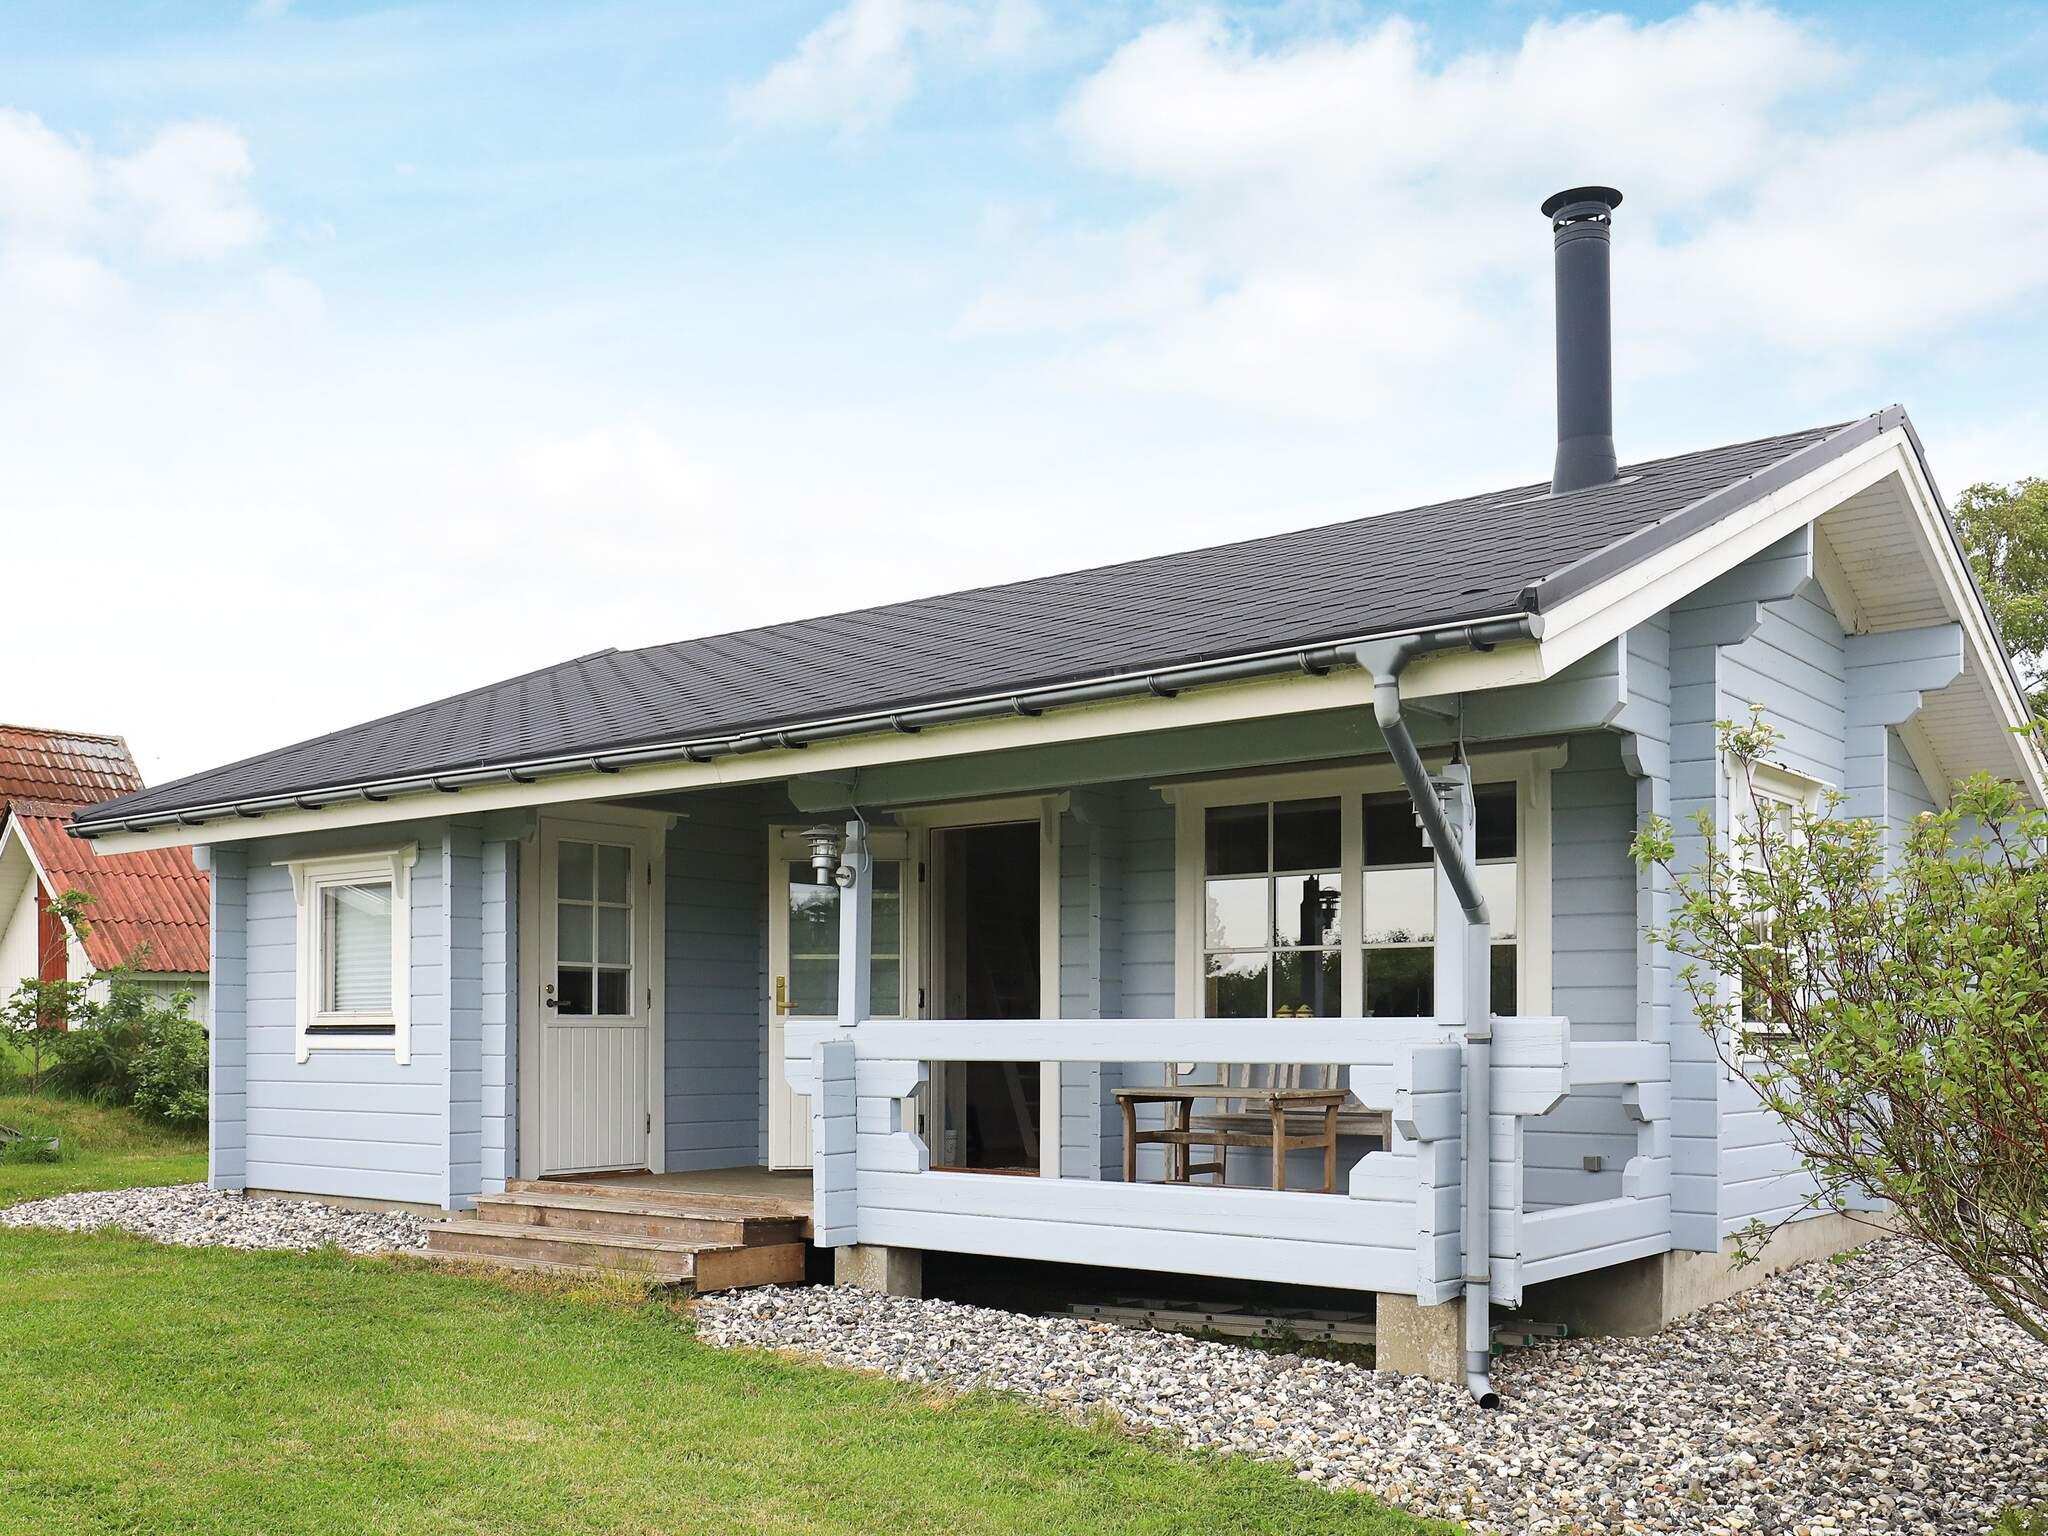 Maison de vacances Eskov Strandpark (603988), Roslev, , Limfjord, Danemark, image 1